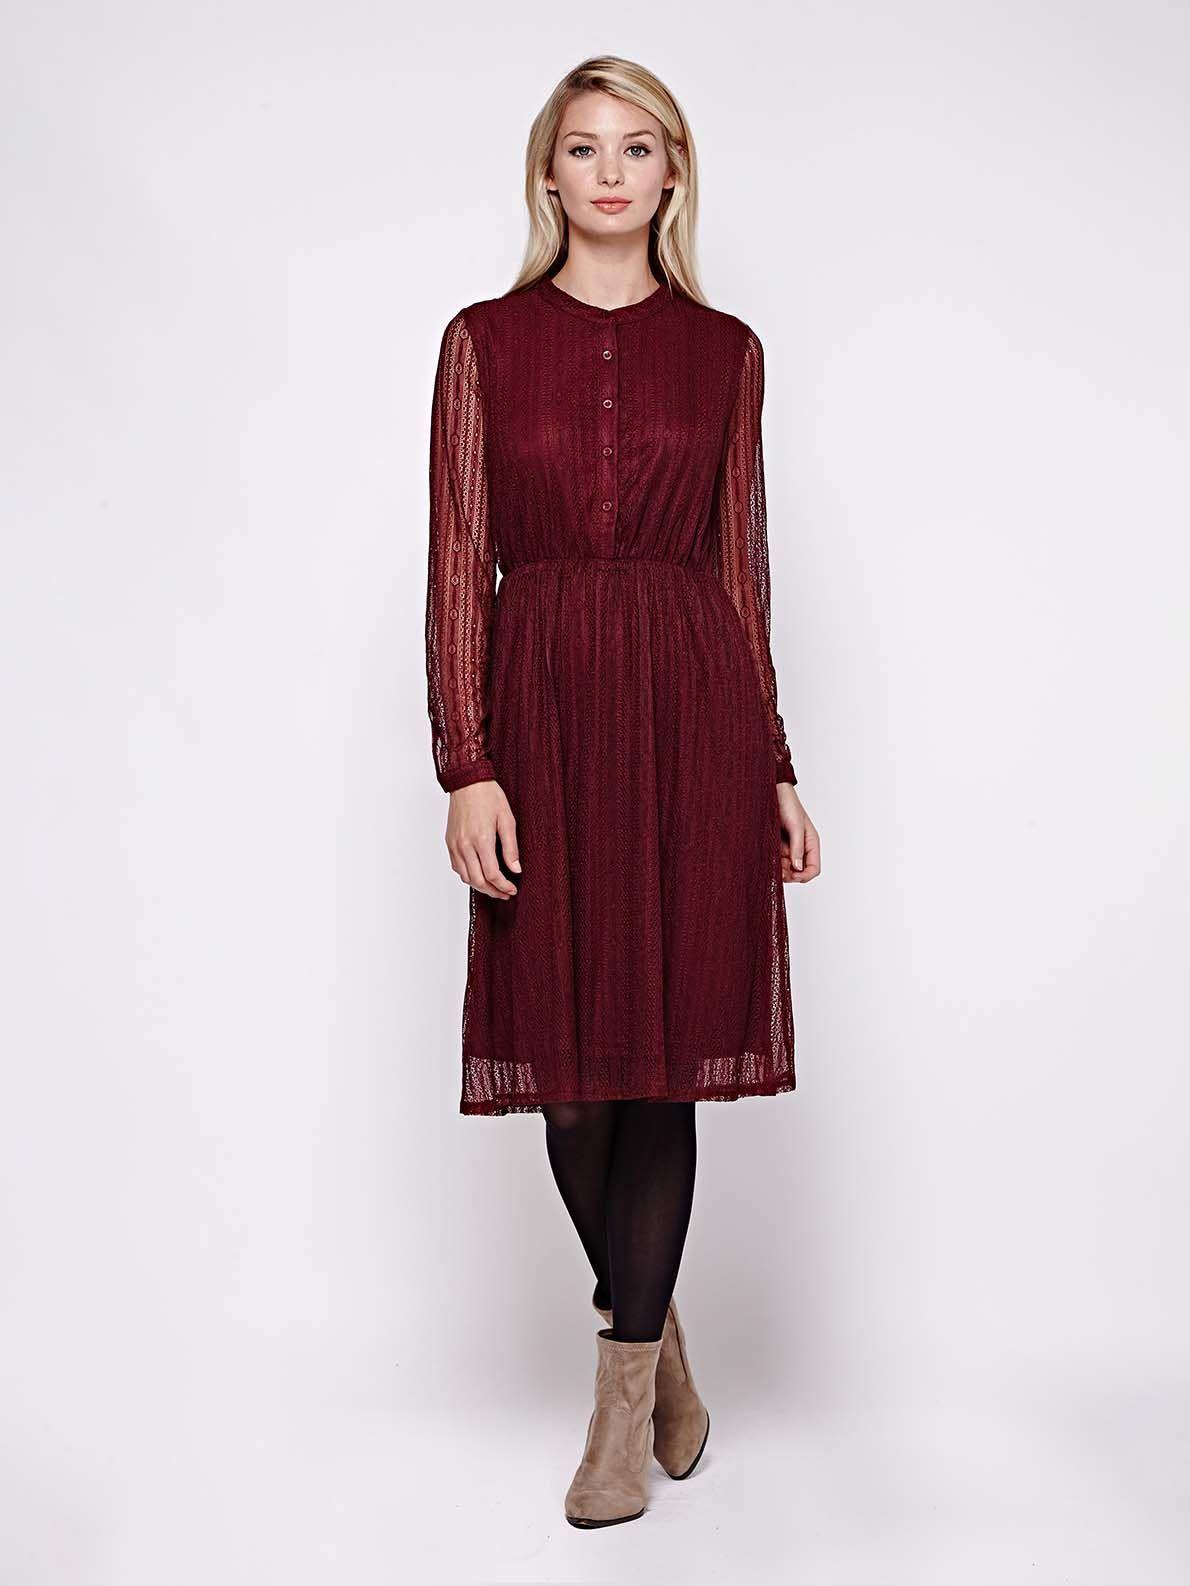 Long sleeve lace midi dress long sleeve lace dress long